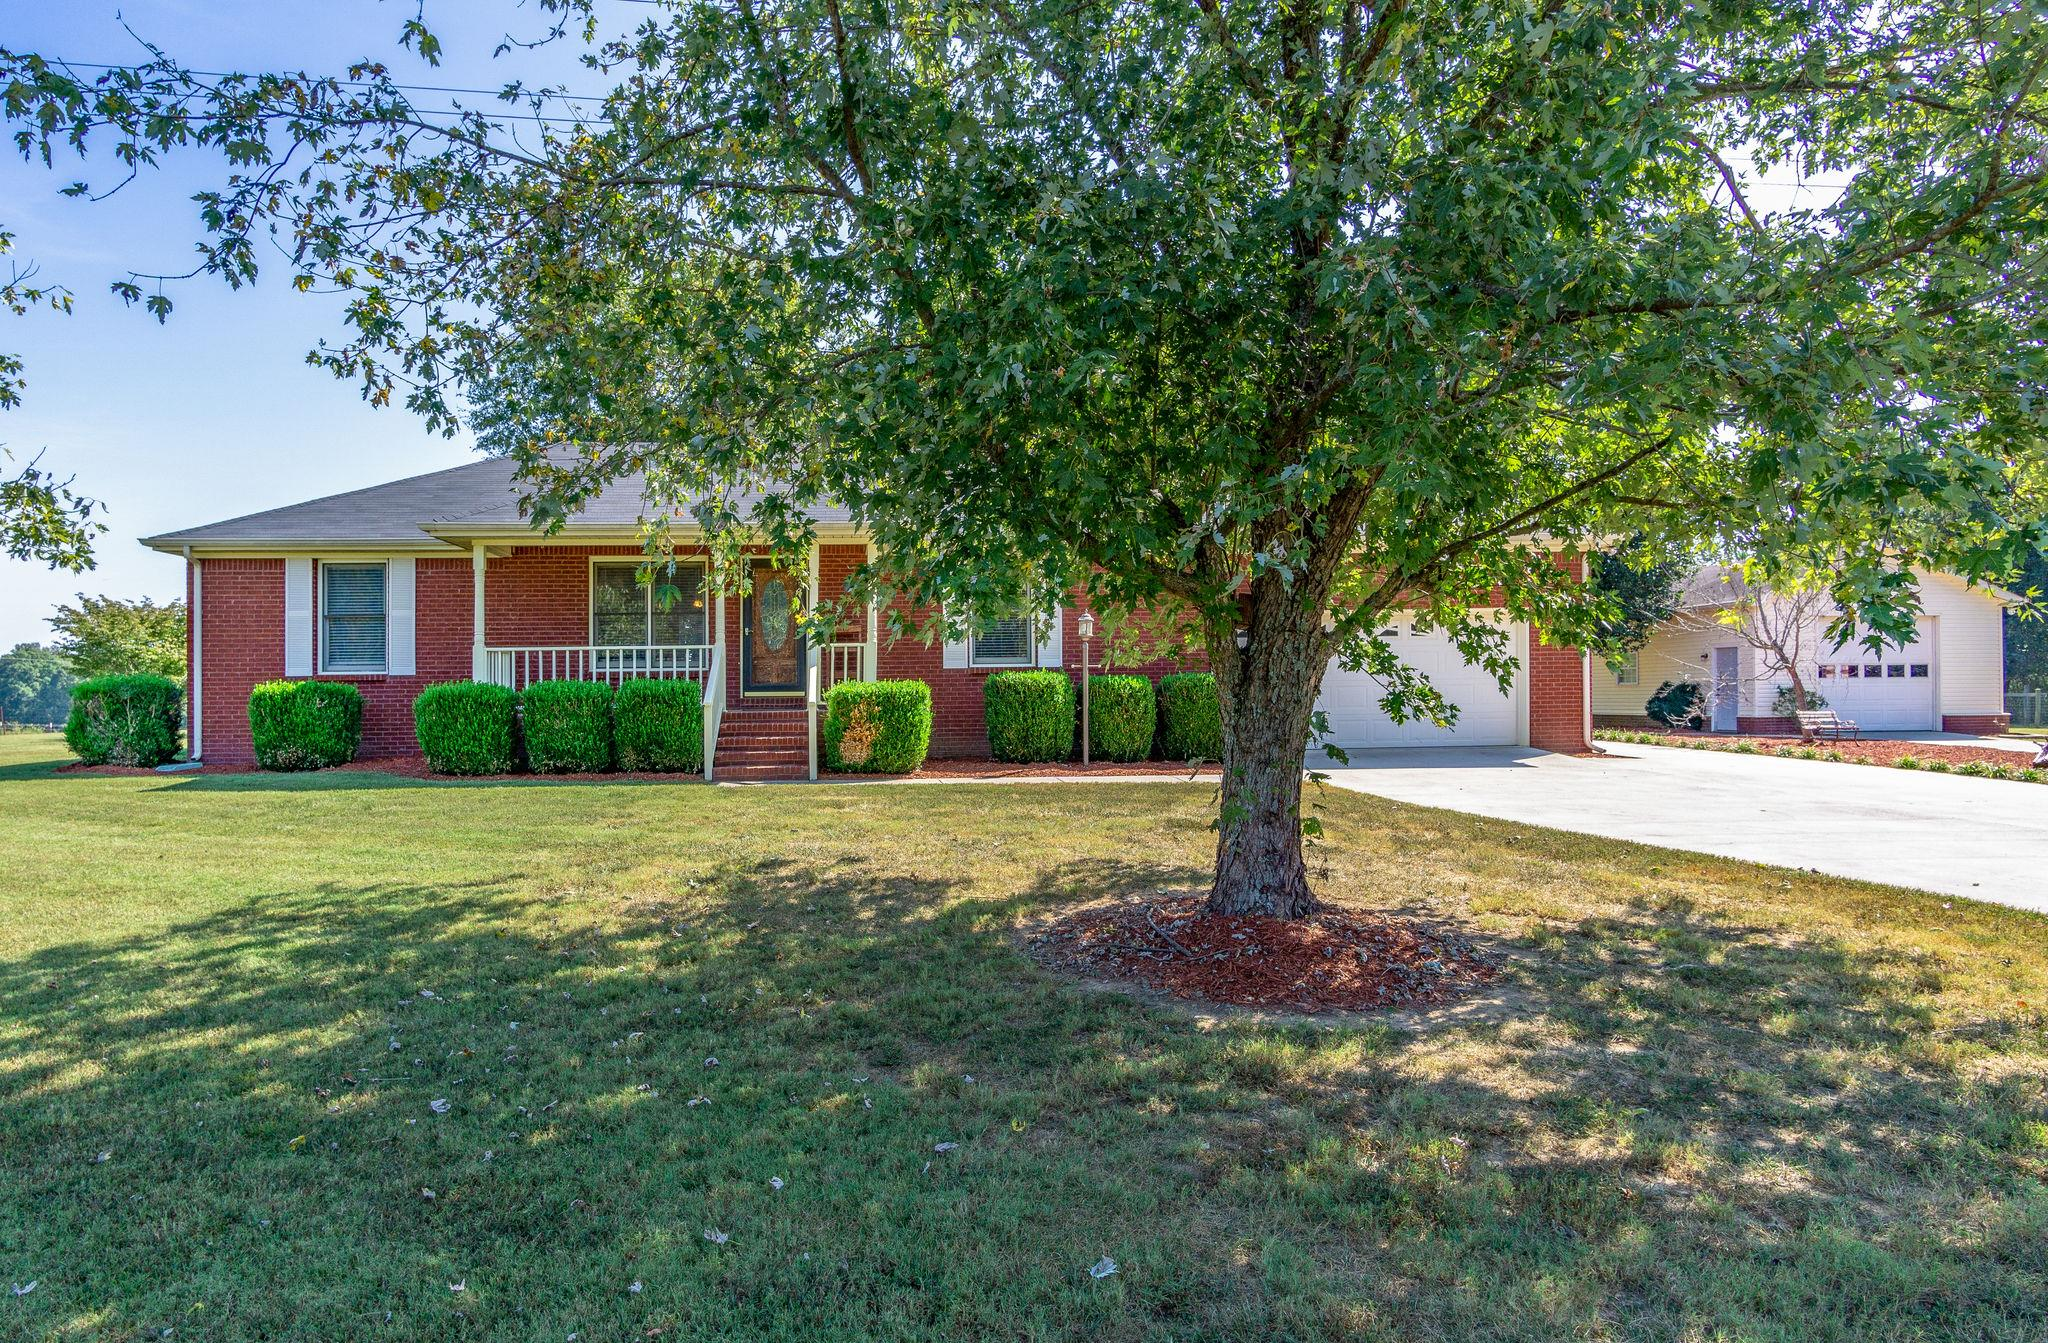 105 N Howard Fitch Rd, N, Kelso, TN 37348 - Kelso, TN real estate listing